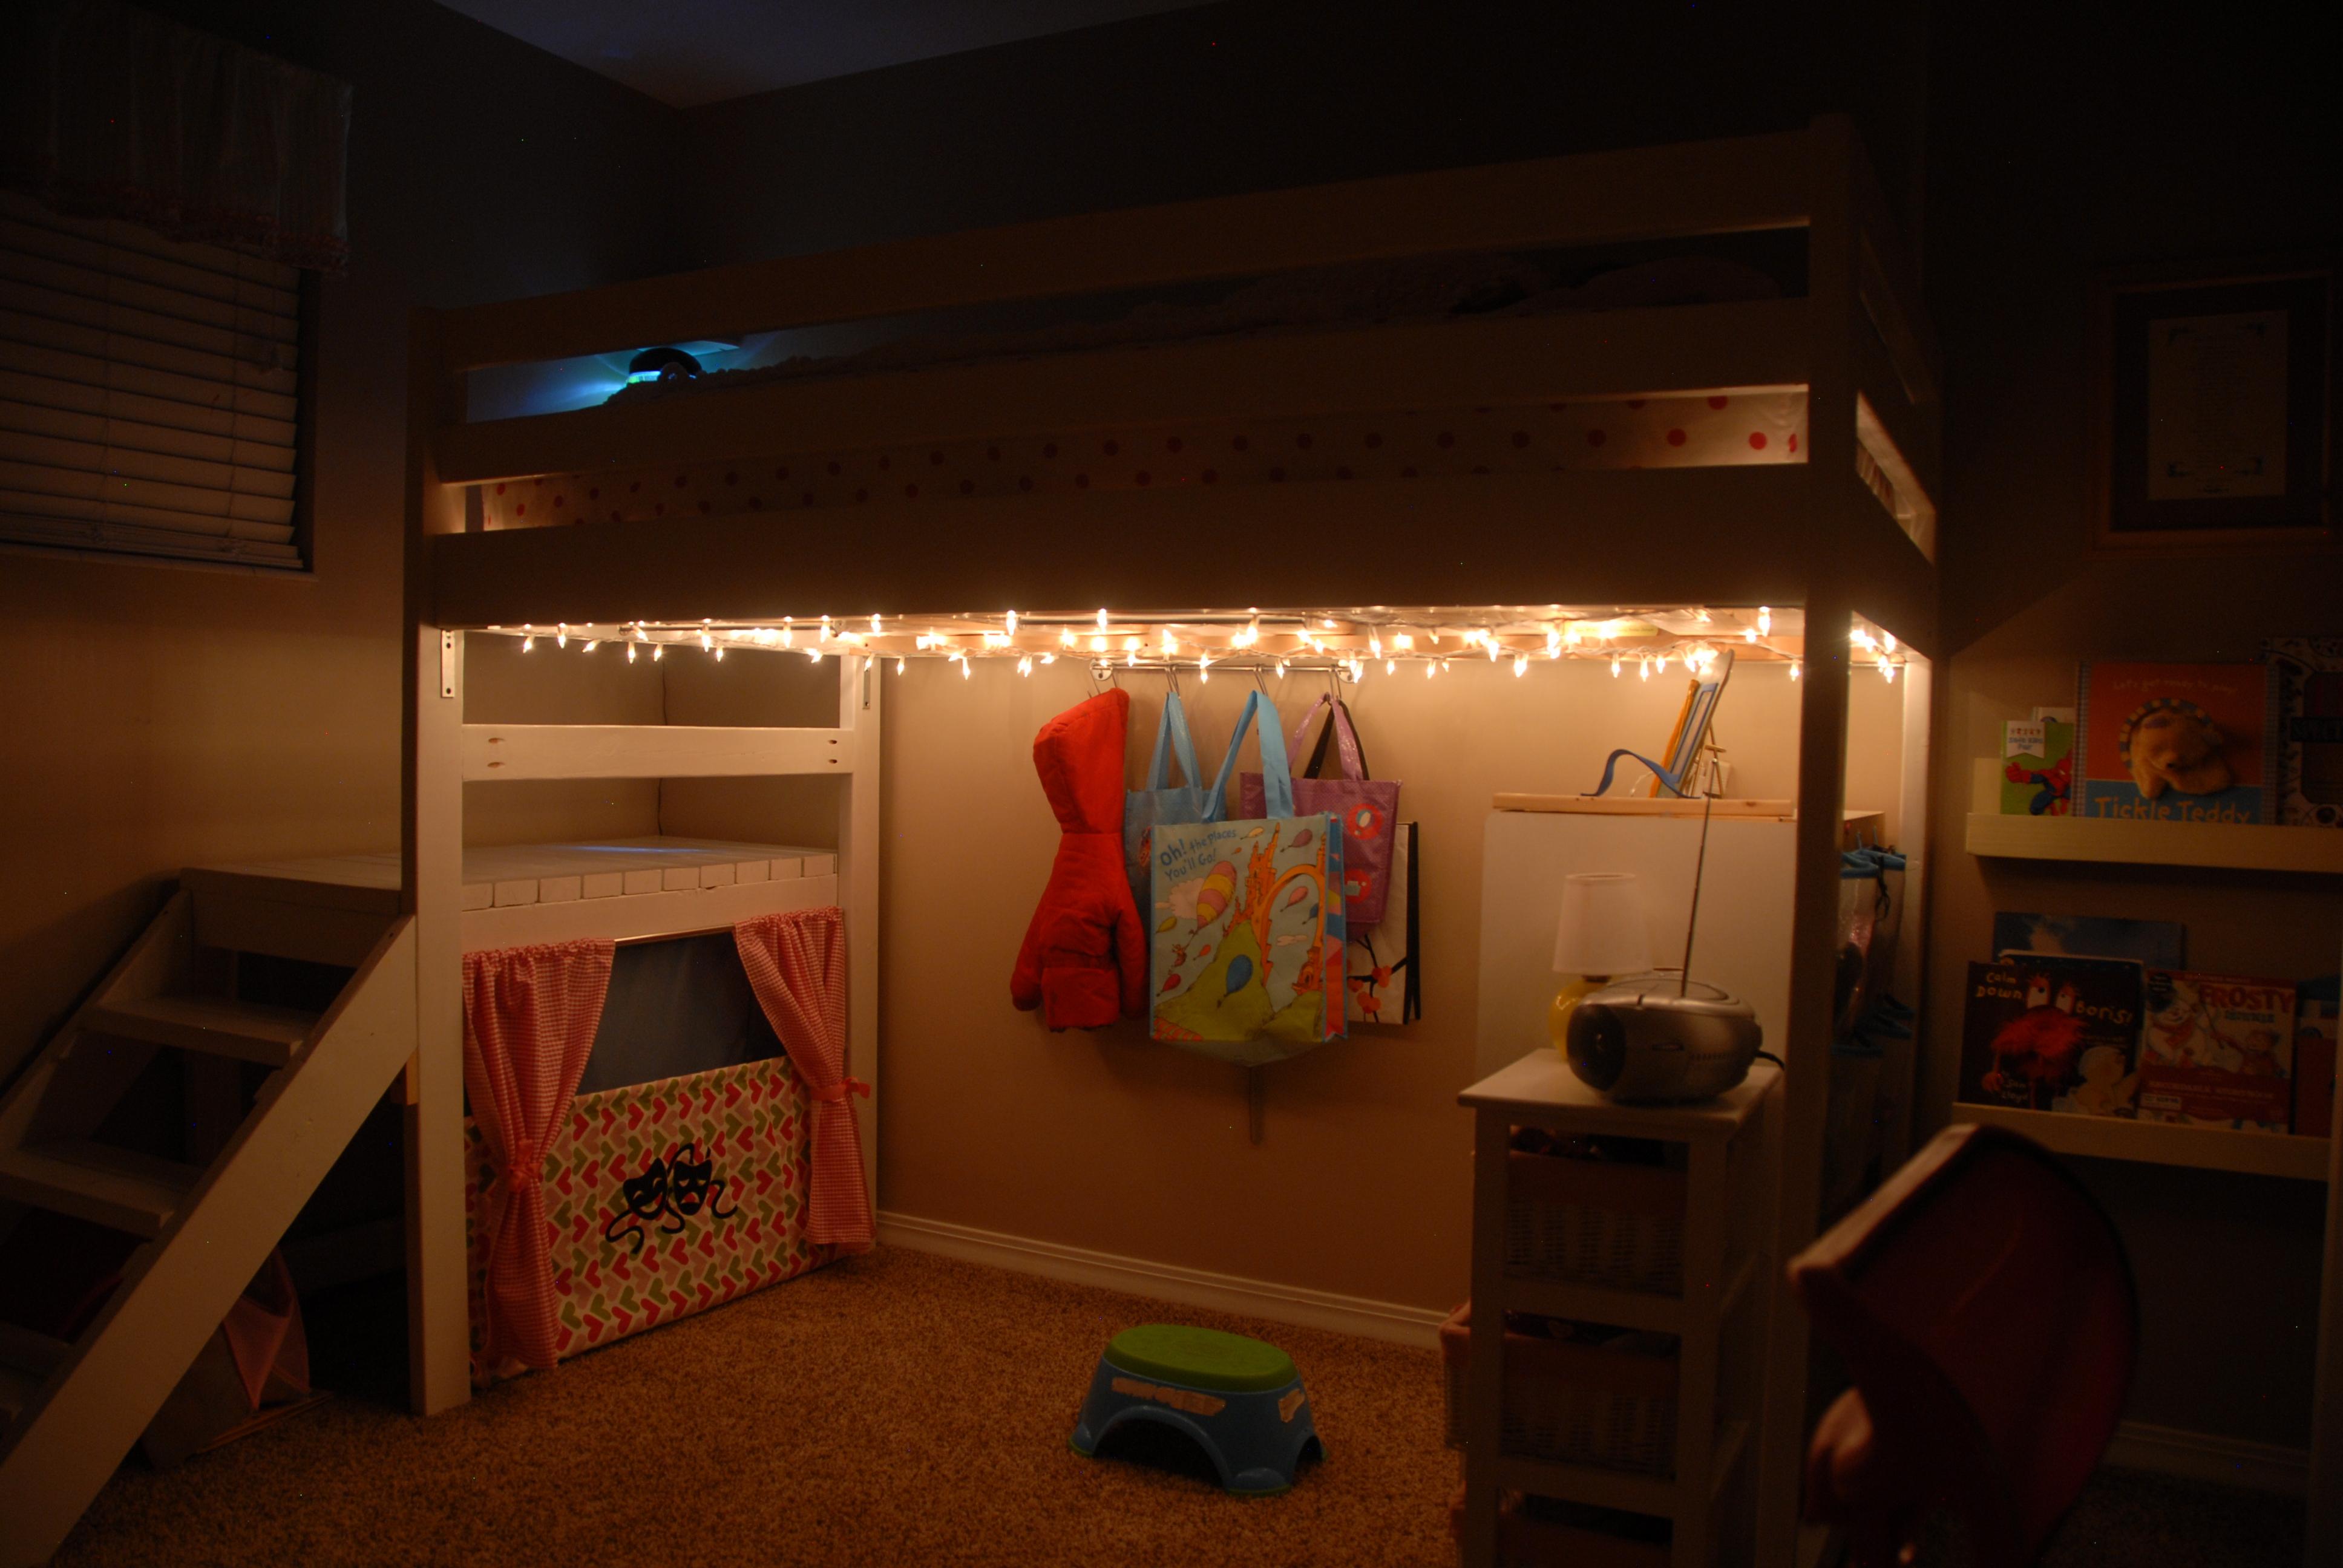 attic closet door ideas - DIY Twin Loft Bed r under $100